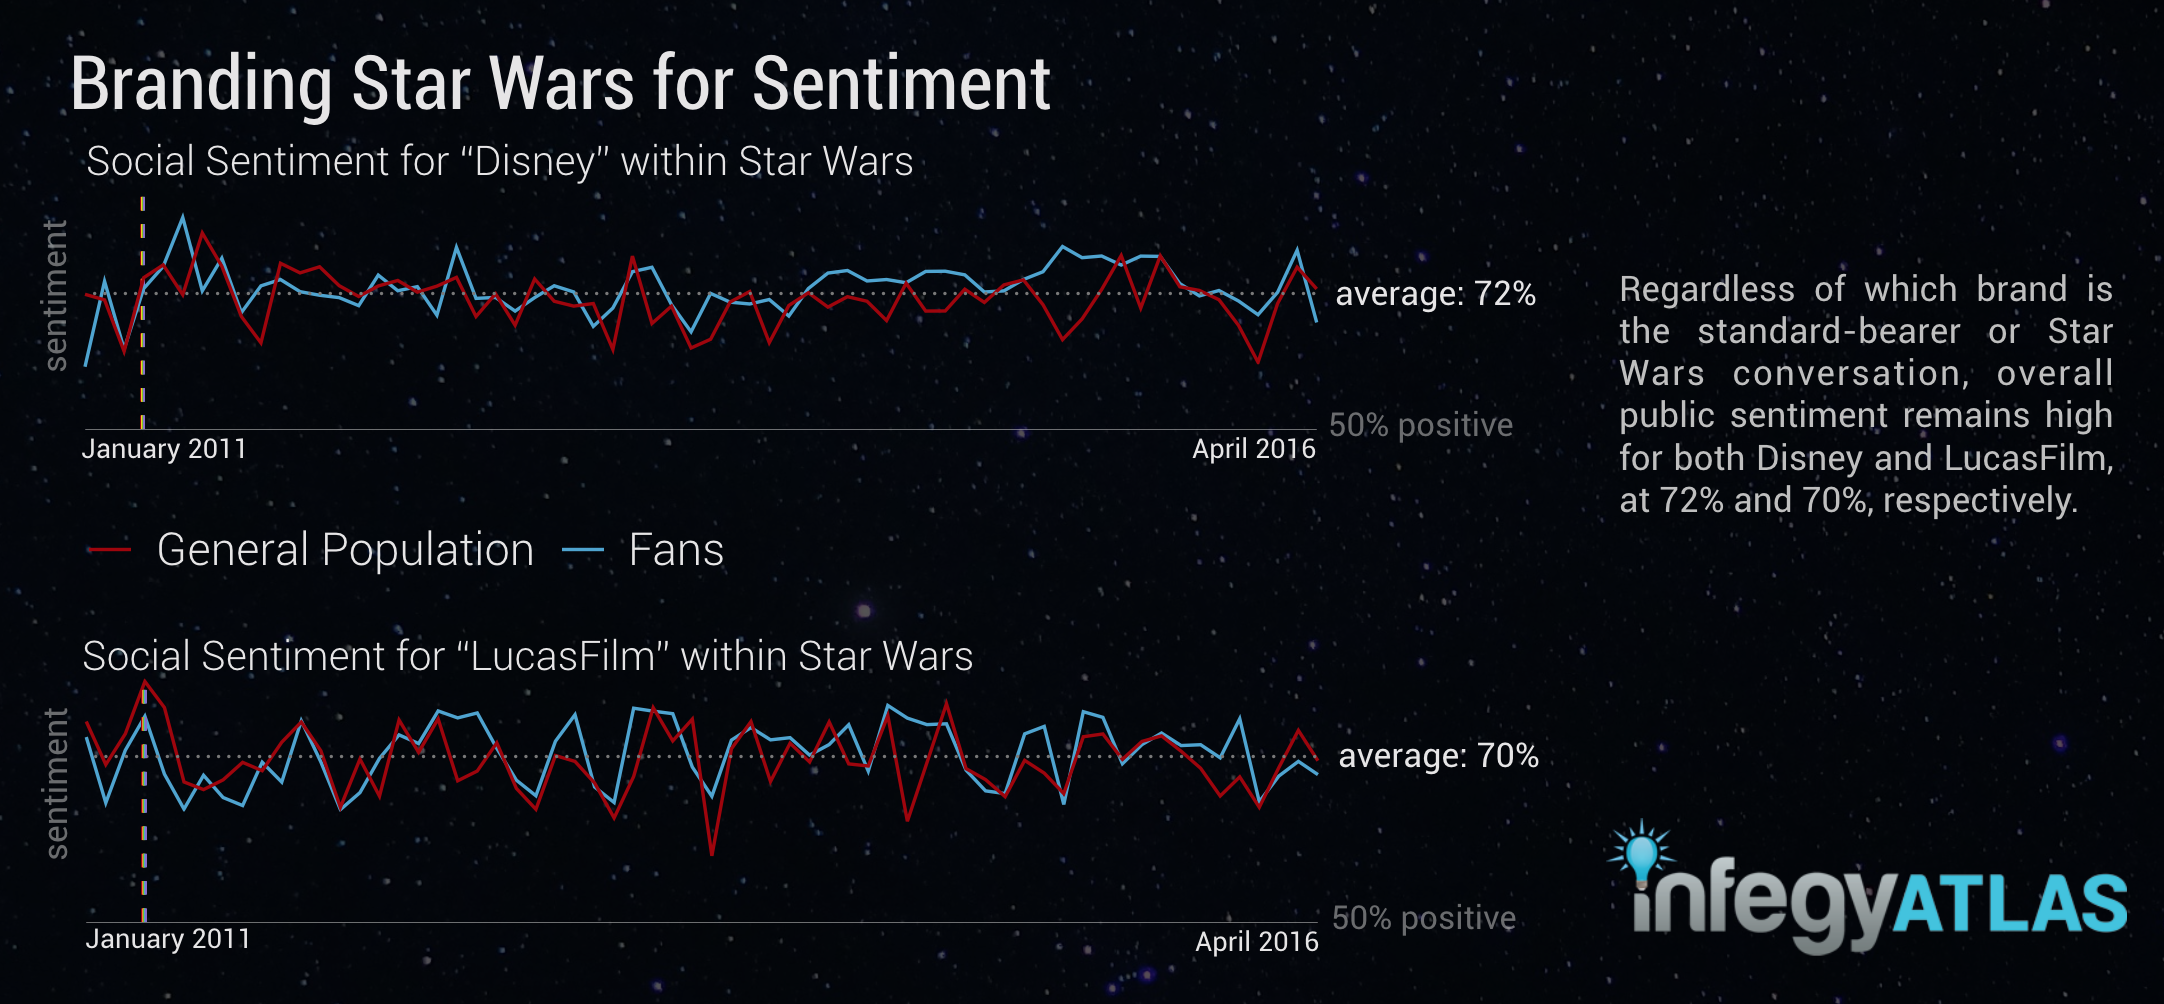 branding-star-wars-for-sentiment.png